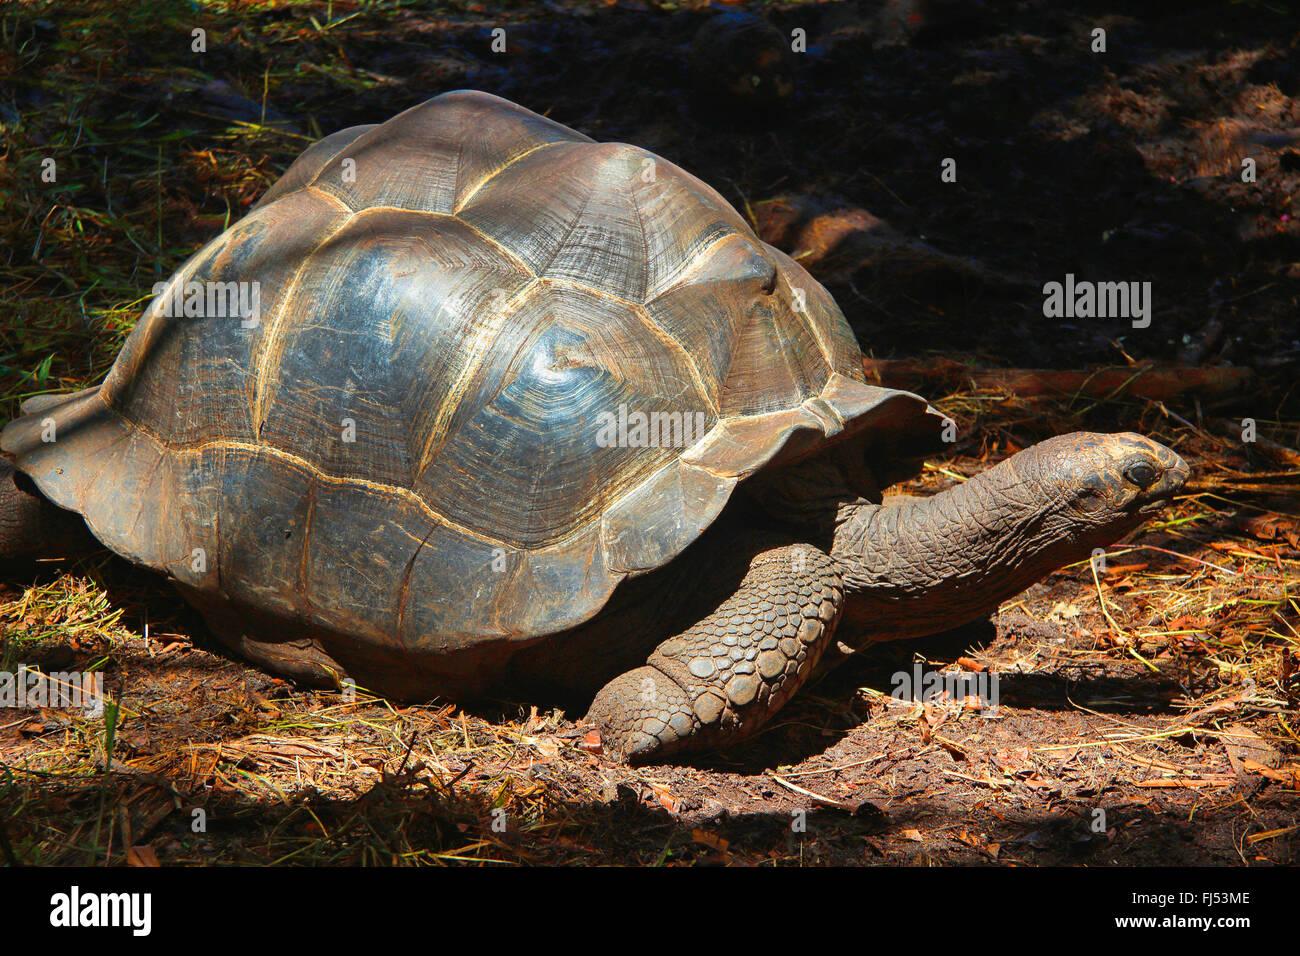 Seychelles tartaruga gigante, Aldabran tartaruga gigante, tartaruga gigante di Aldabra (Aldabrachelys gigantea, Foto Stock